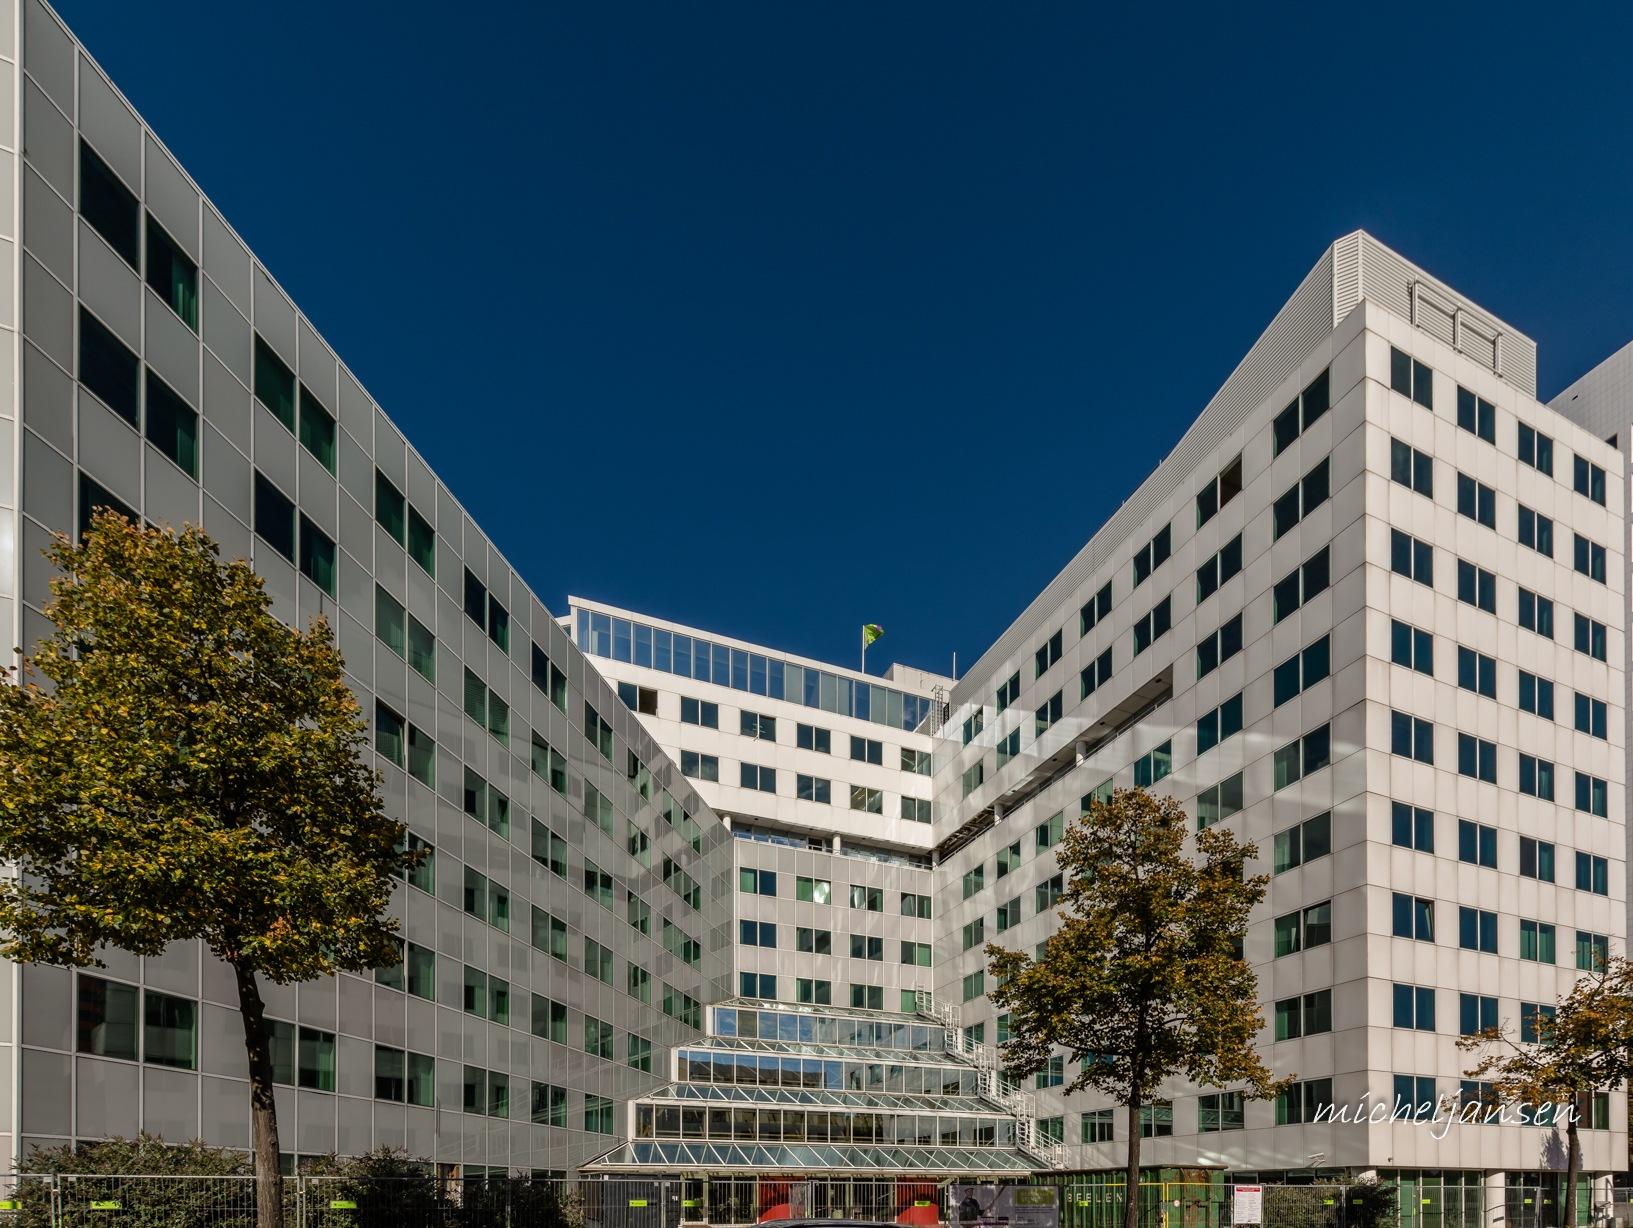 Eneco HQ entrance - Rotterdam Alexander by Micheljansenfotografie